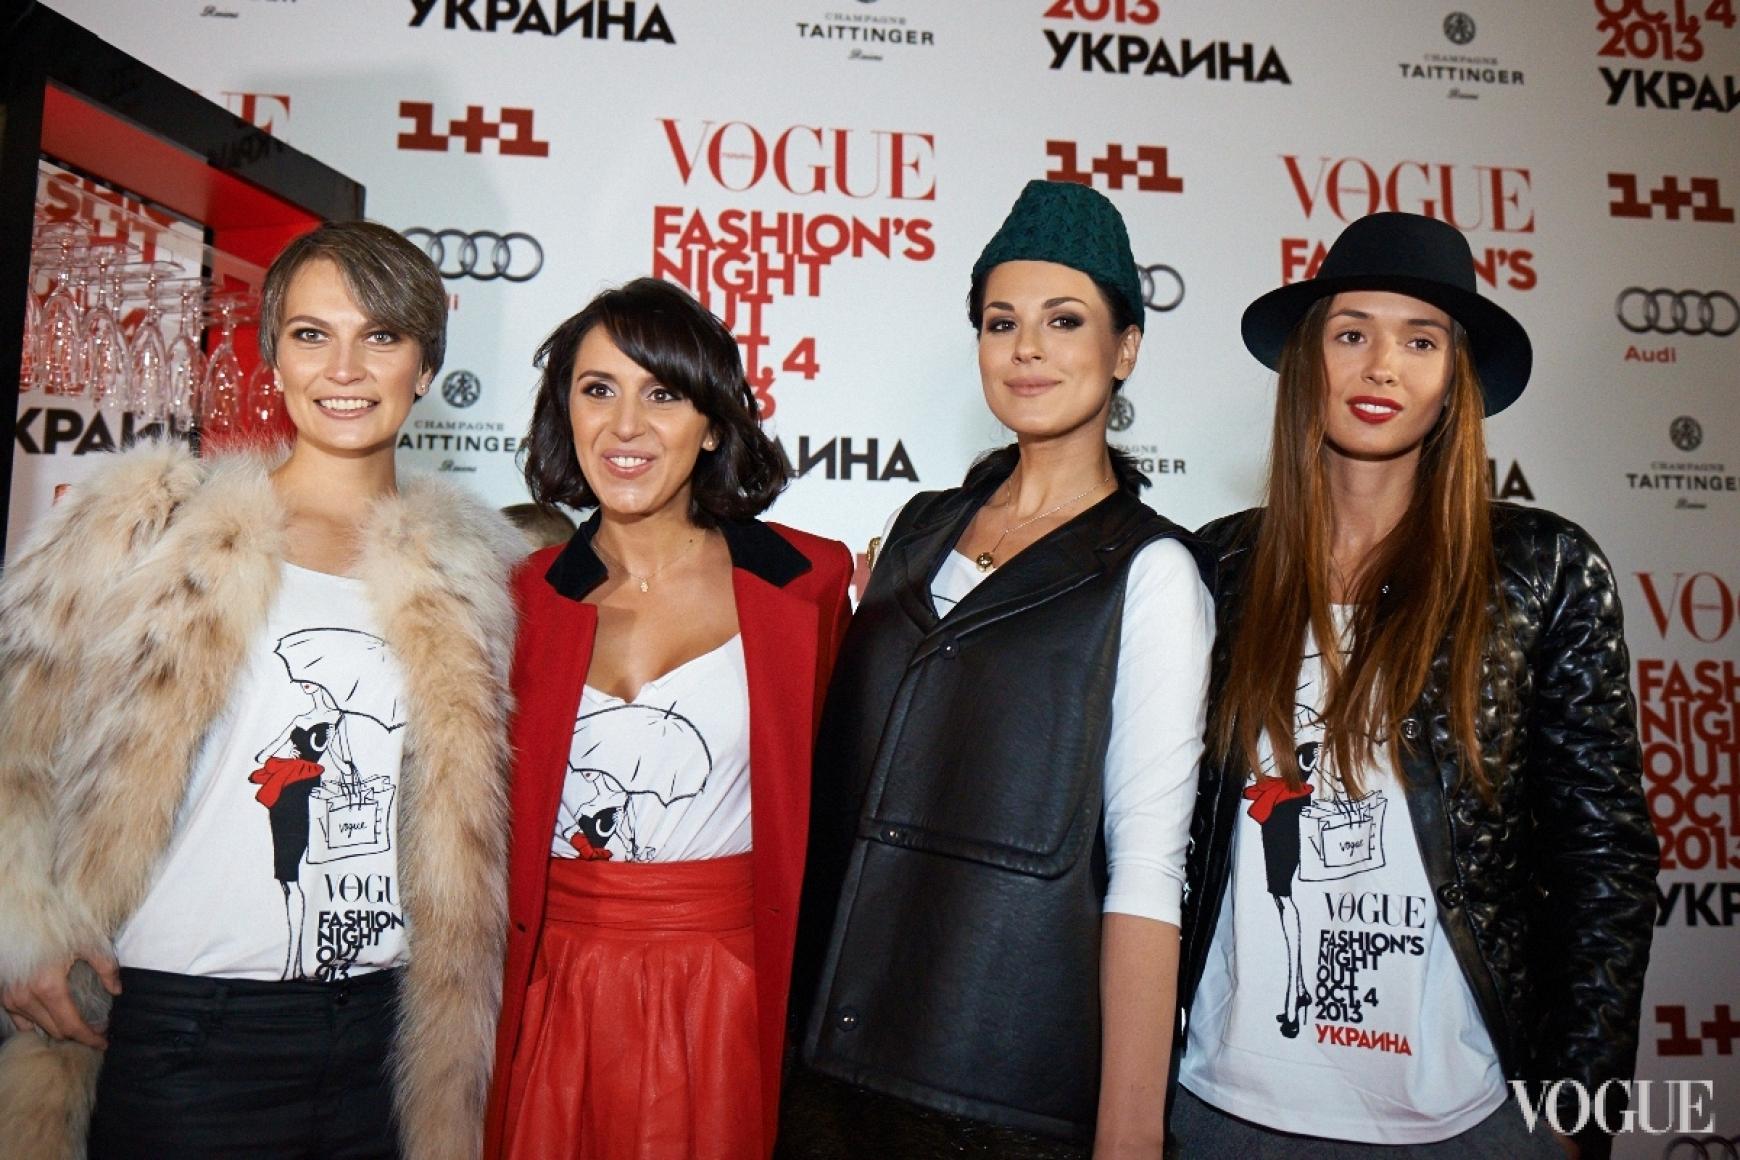 Маша Цуканова, Джамала, Маша Ефросинина, Лиза Ющенко